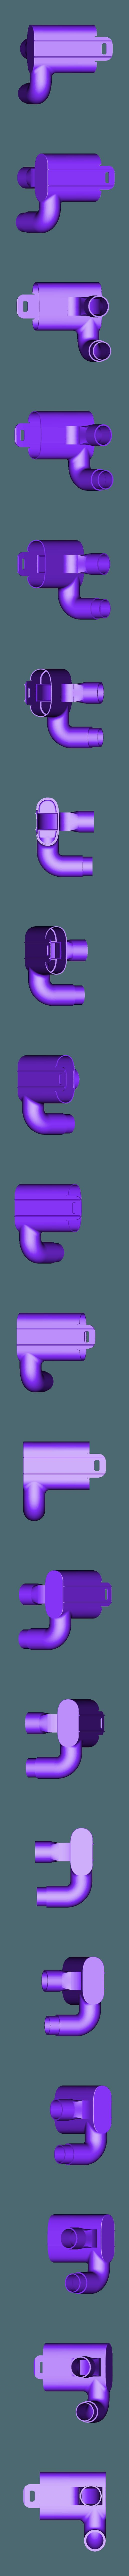 Charlotte Valve 1.stl Download free STL file EASY COVID 19 - Emergency mask for hospital ventilators • 3D printing design, isinnova